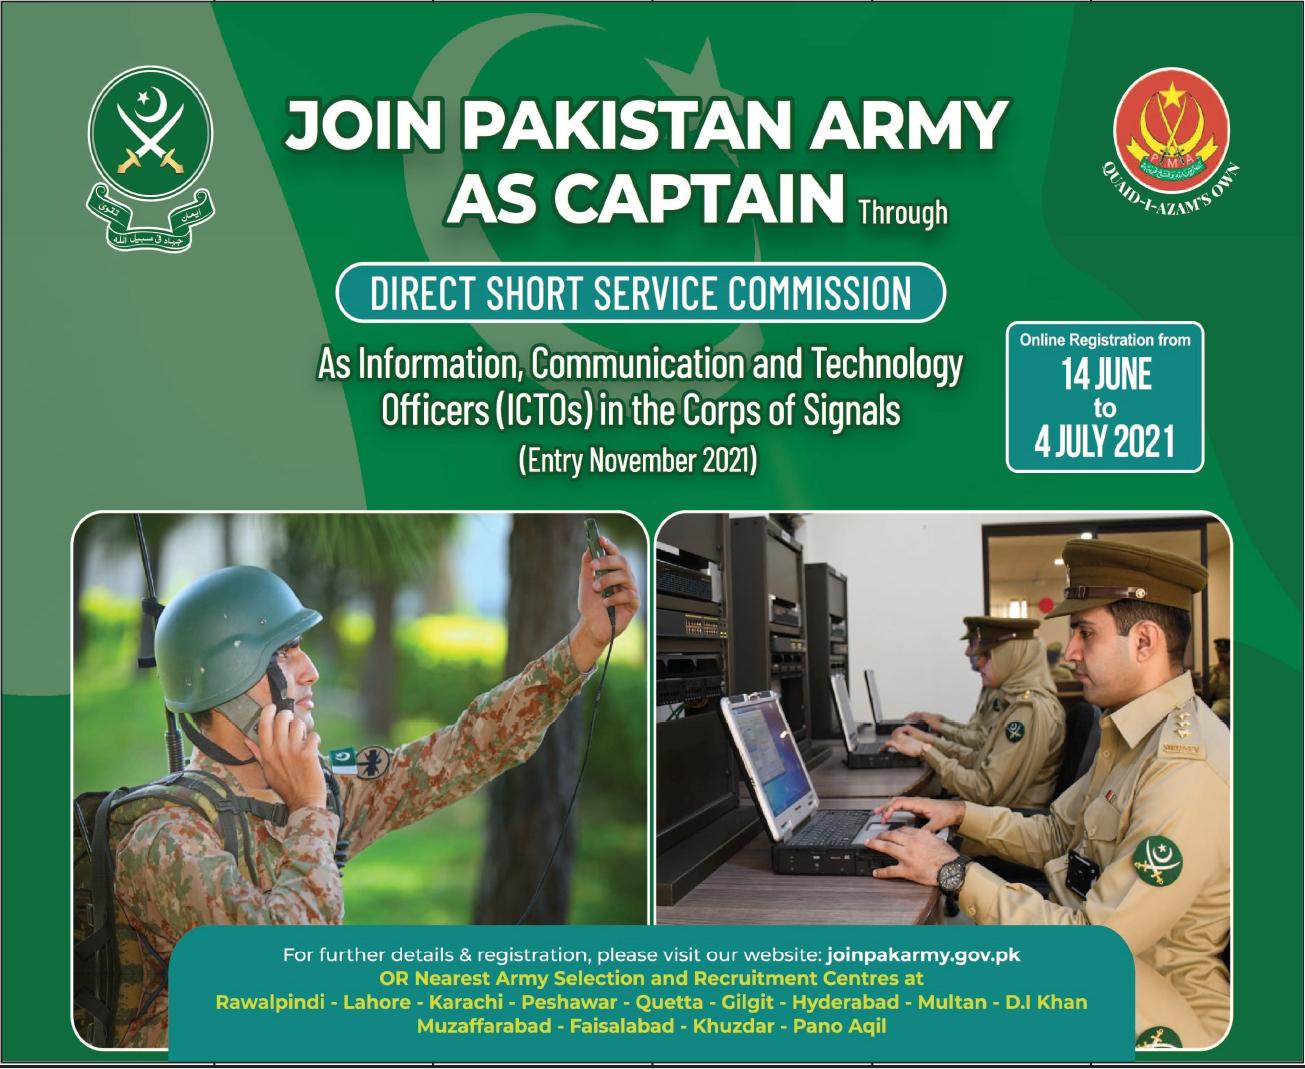 Pakistan Army as Captain through Direct Short Service Commission (DSSC) Jobs 2021 Online Registration - Join Pak Army as Captain 2021